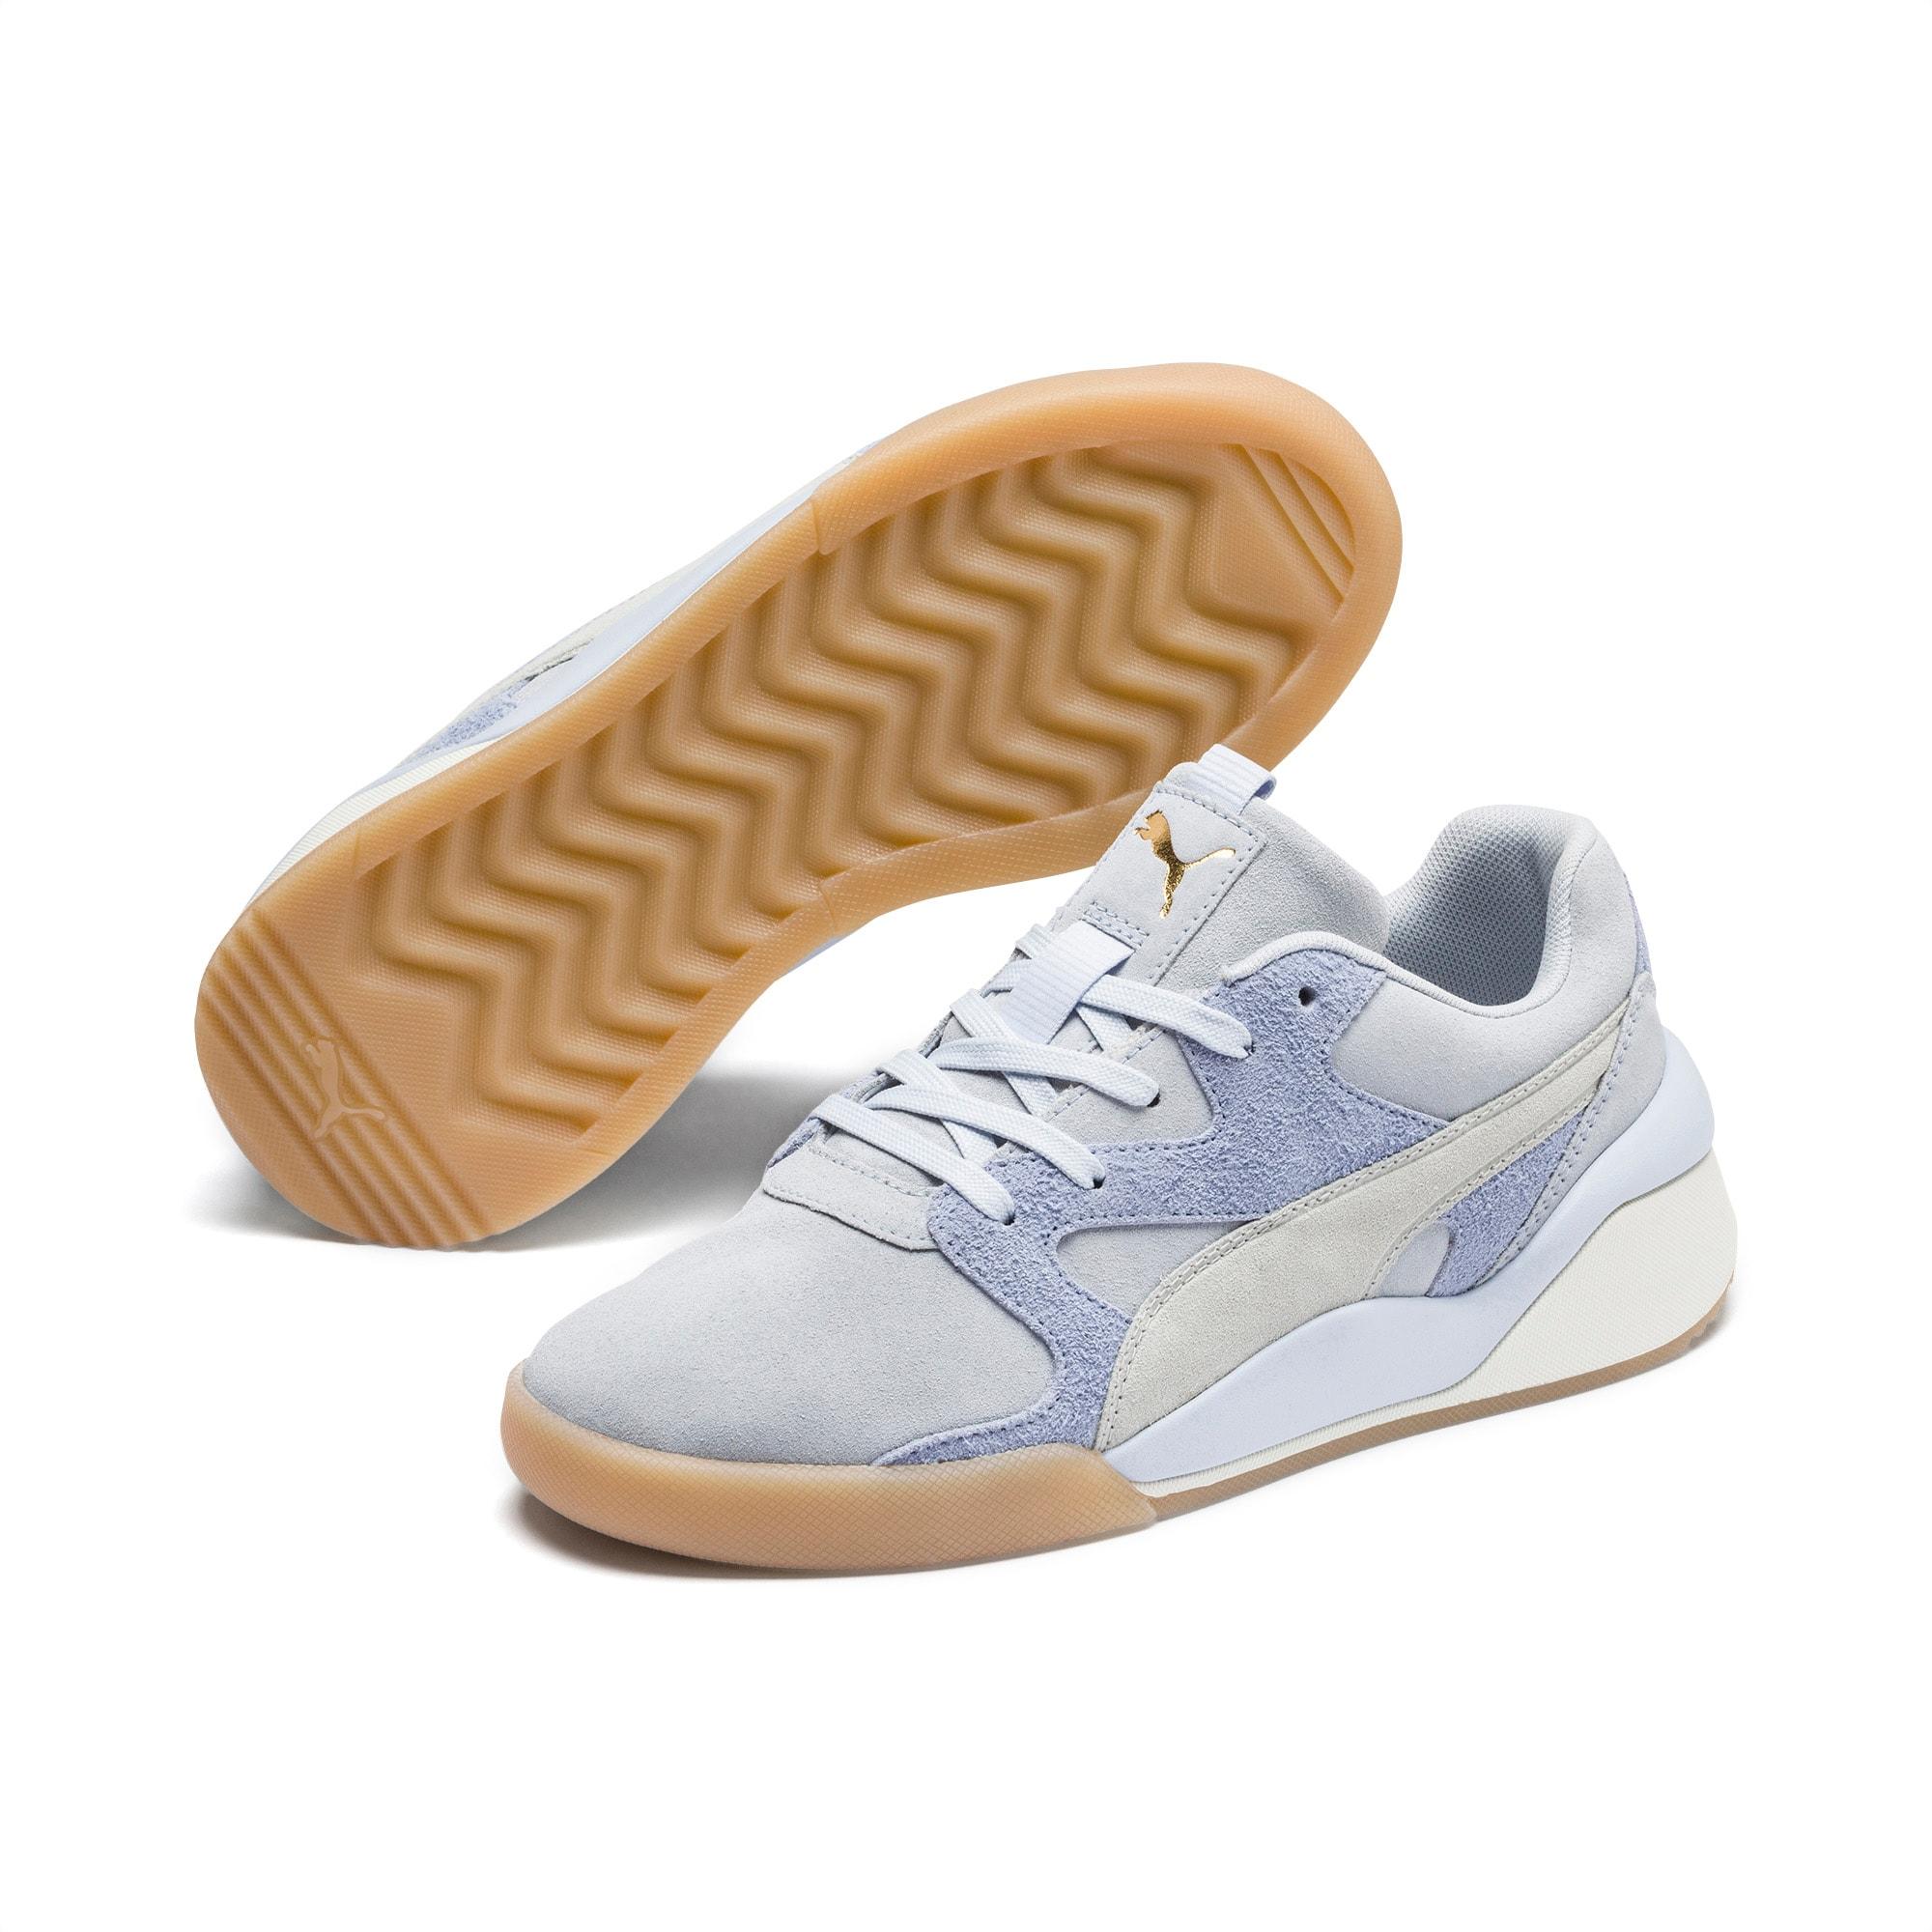 Aeon Rewind Damen Sneaker